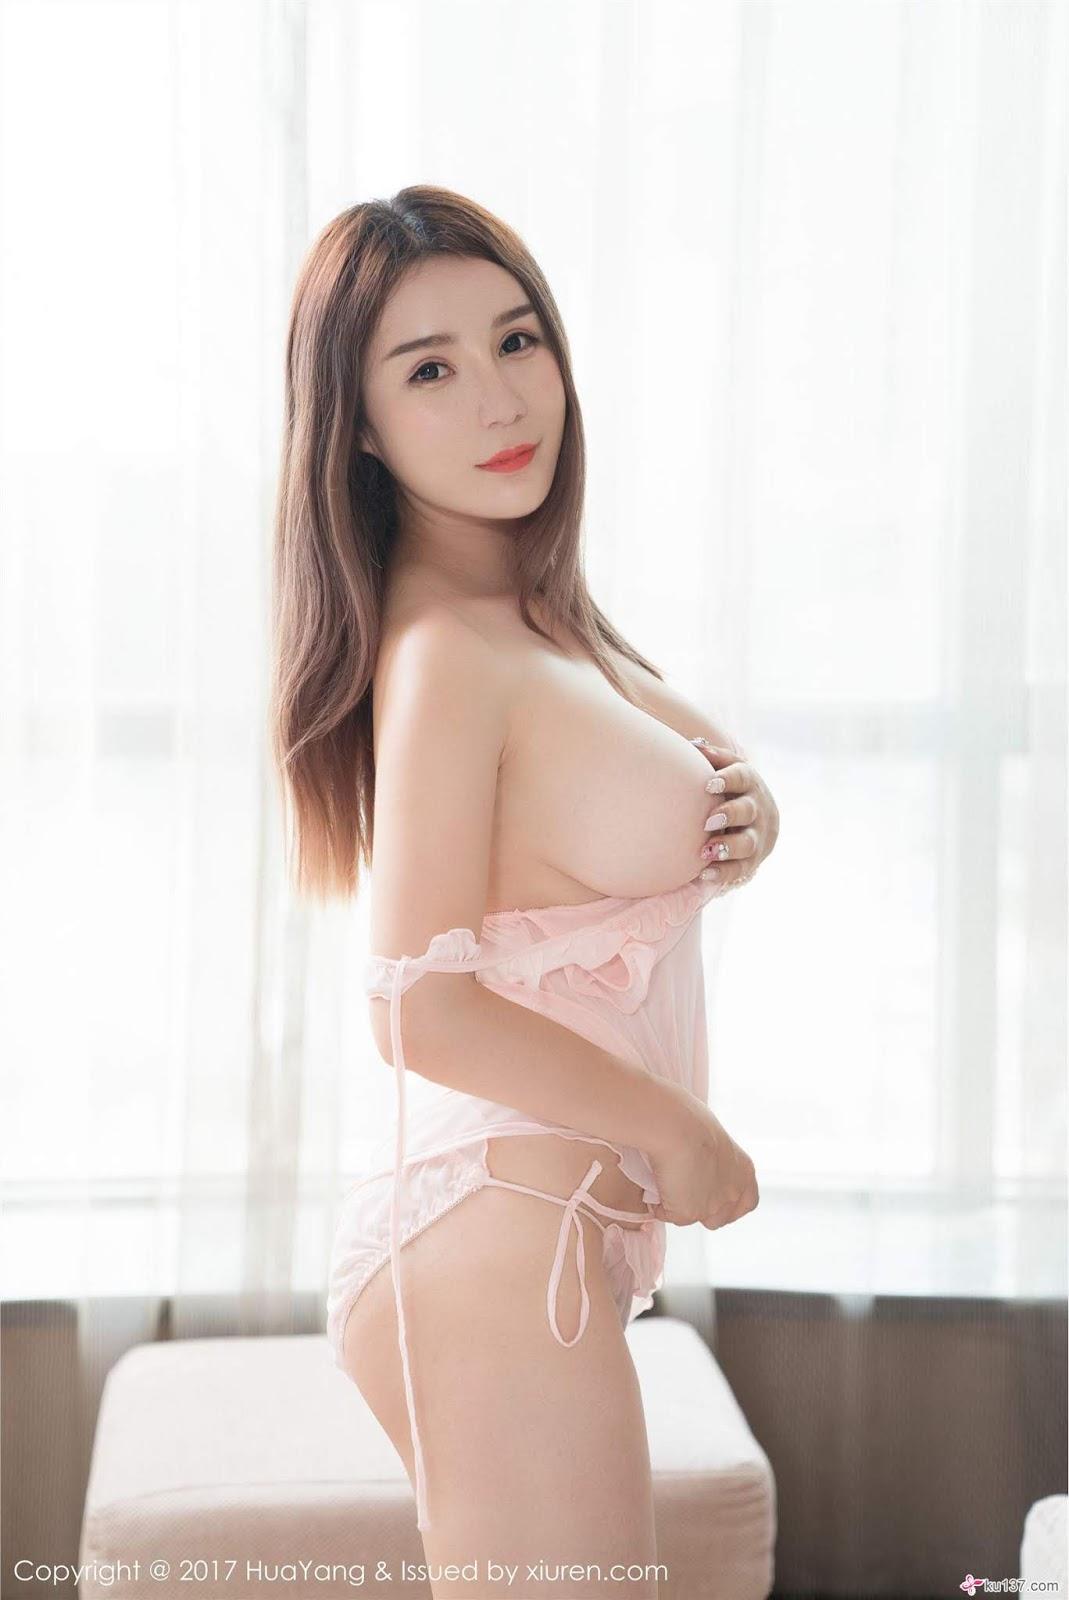 [HuaYang] 2017.08.14 VOL.001 陈秋雨